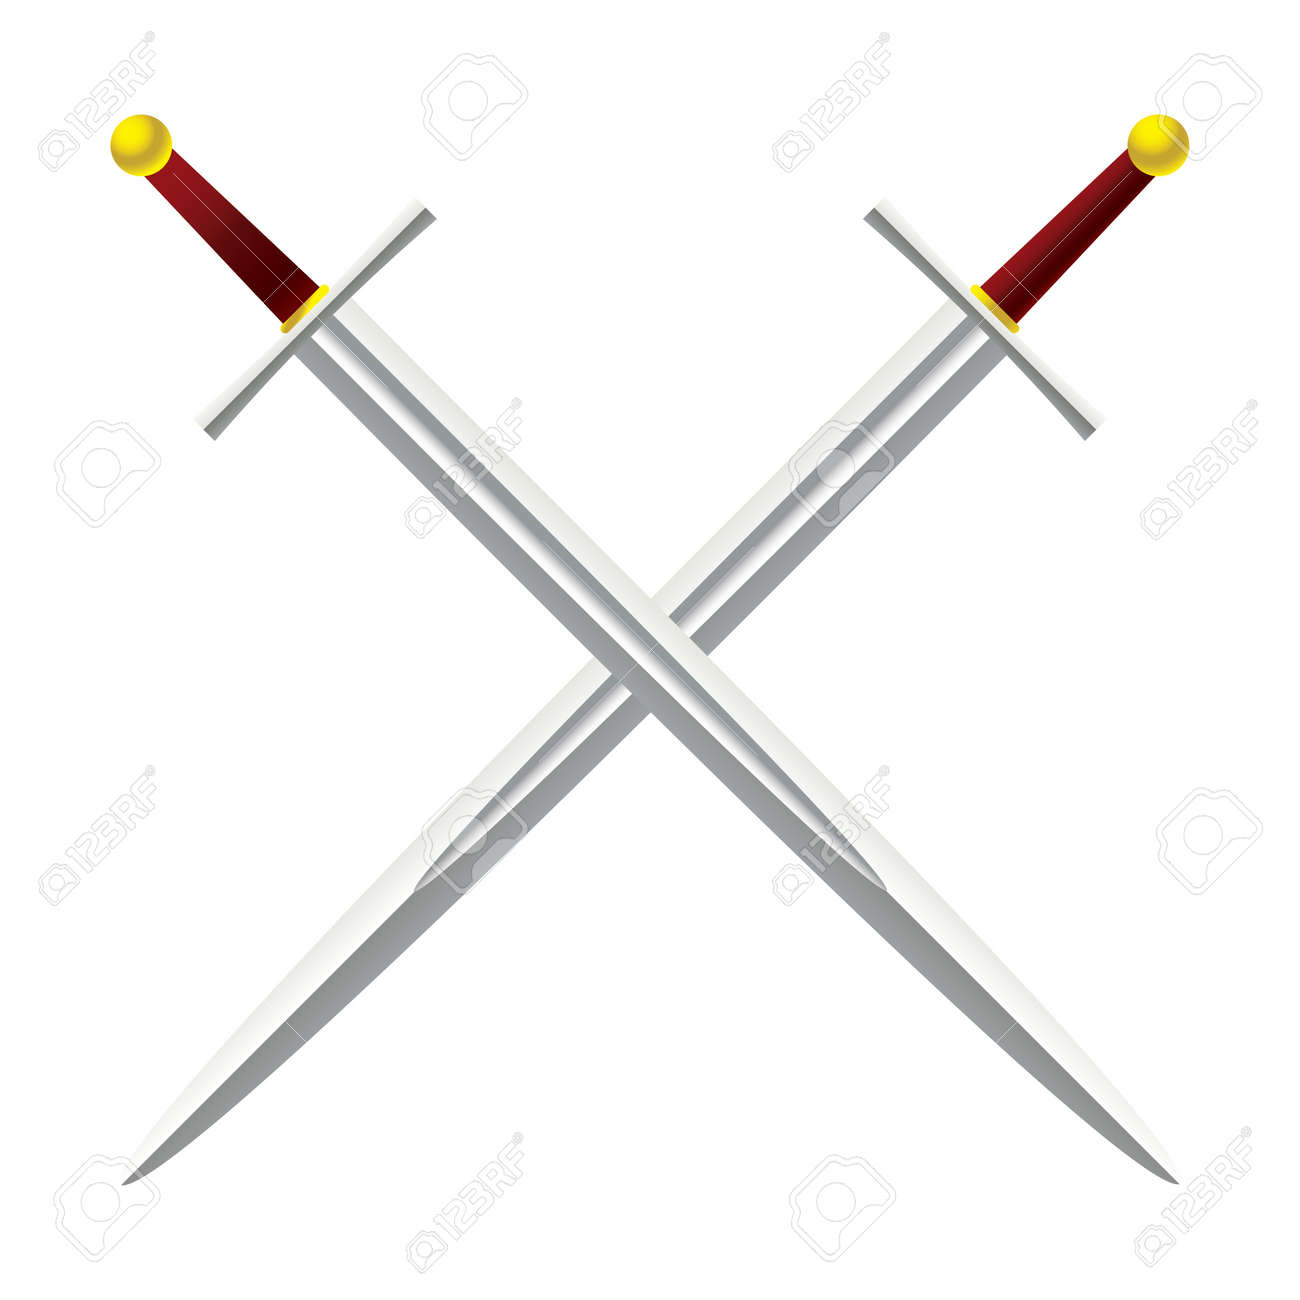 Silver metal sword crossed with red handles - 9923783